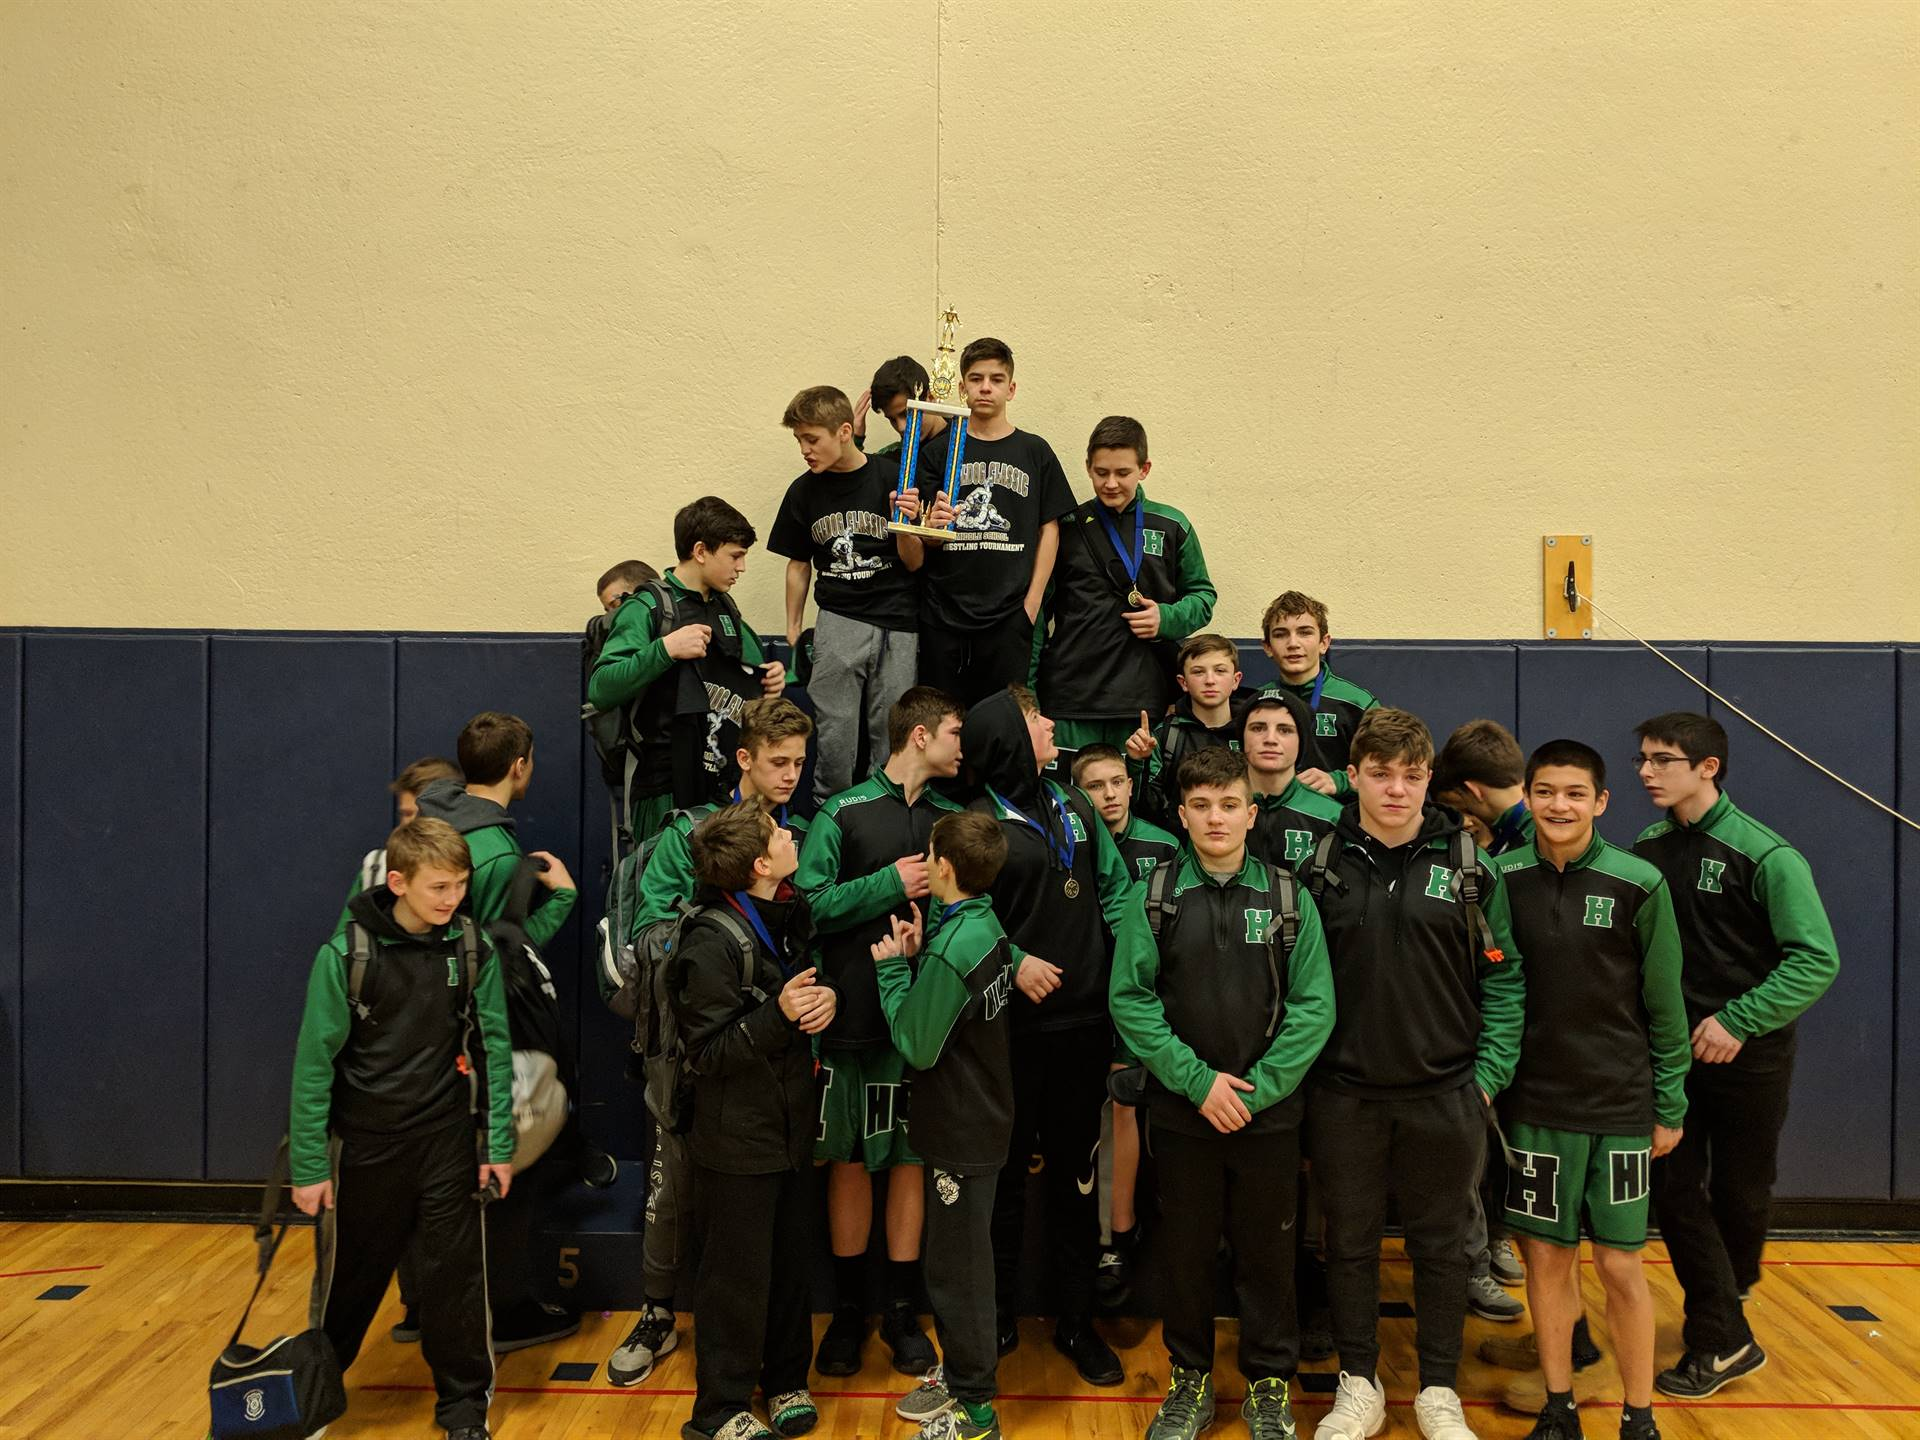 Bulldog Classic 2018 - Middle School Wrestling Team